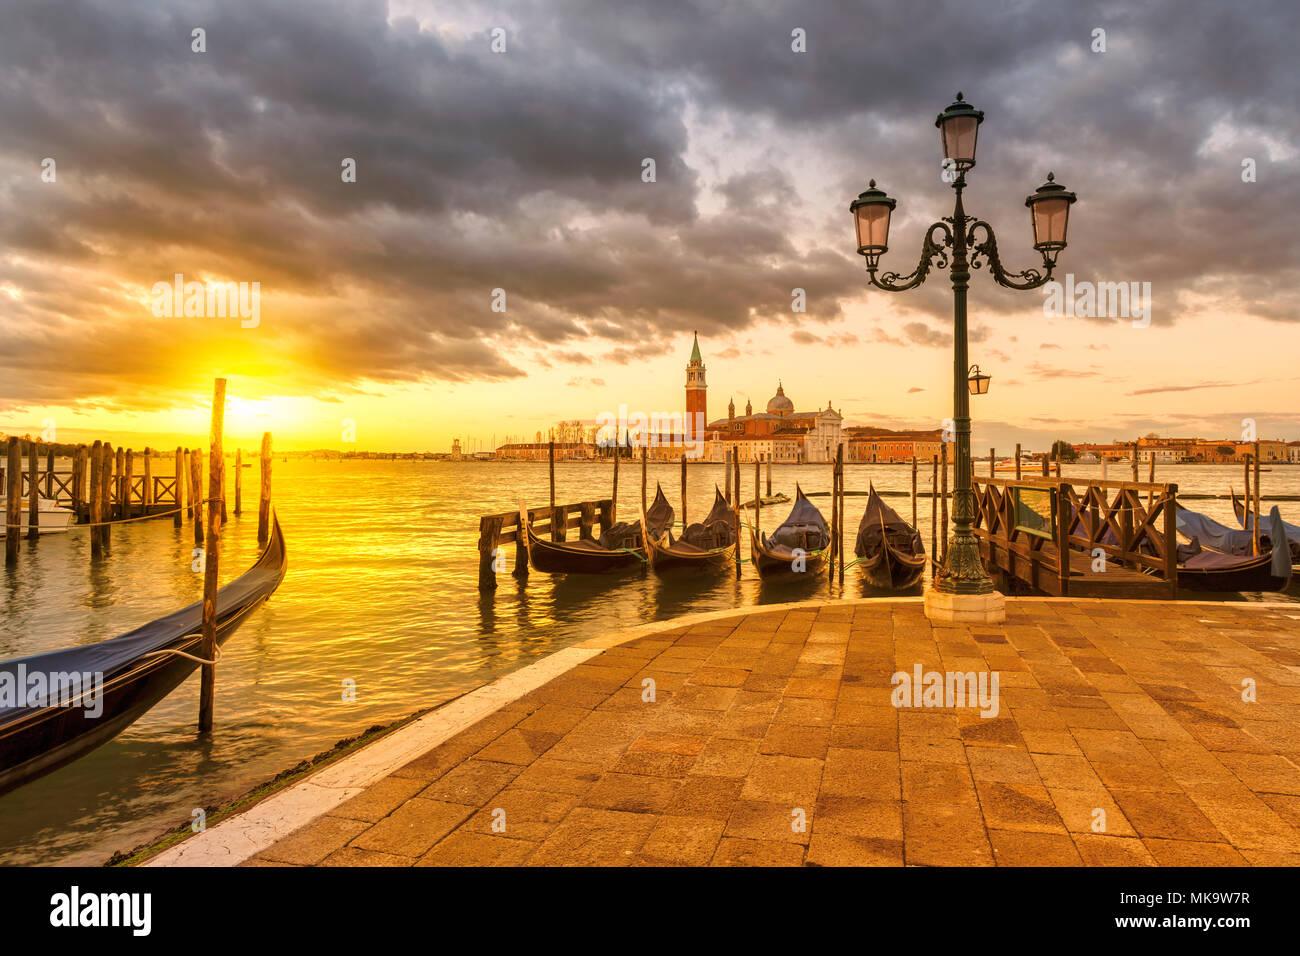 Venice sunrise, Italy - Stock Image